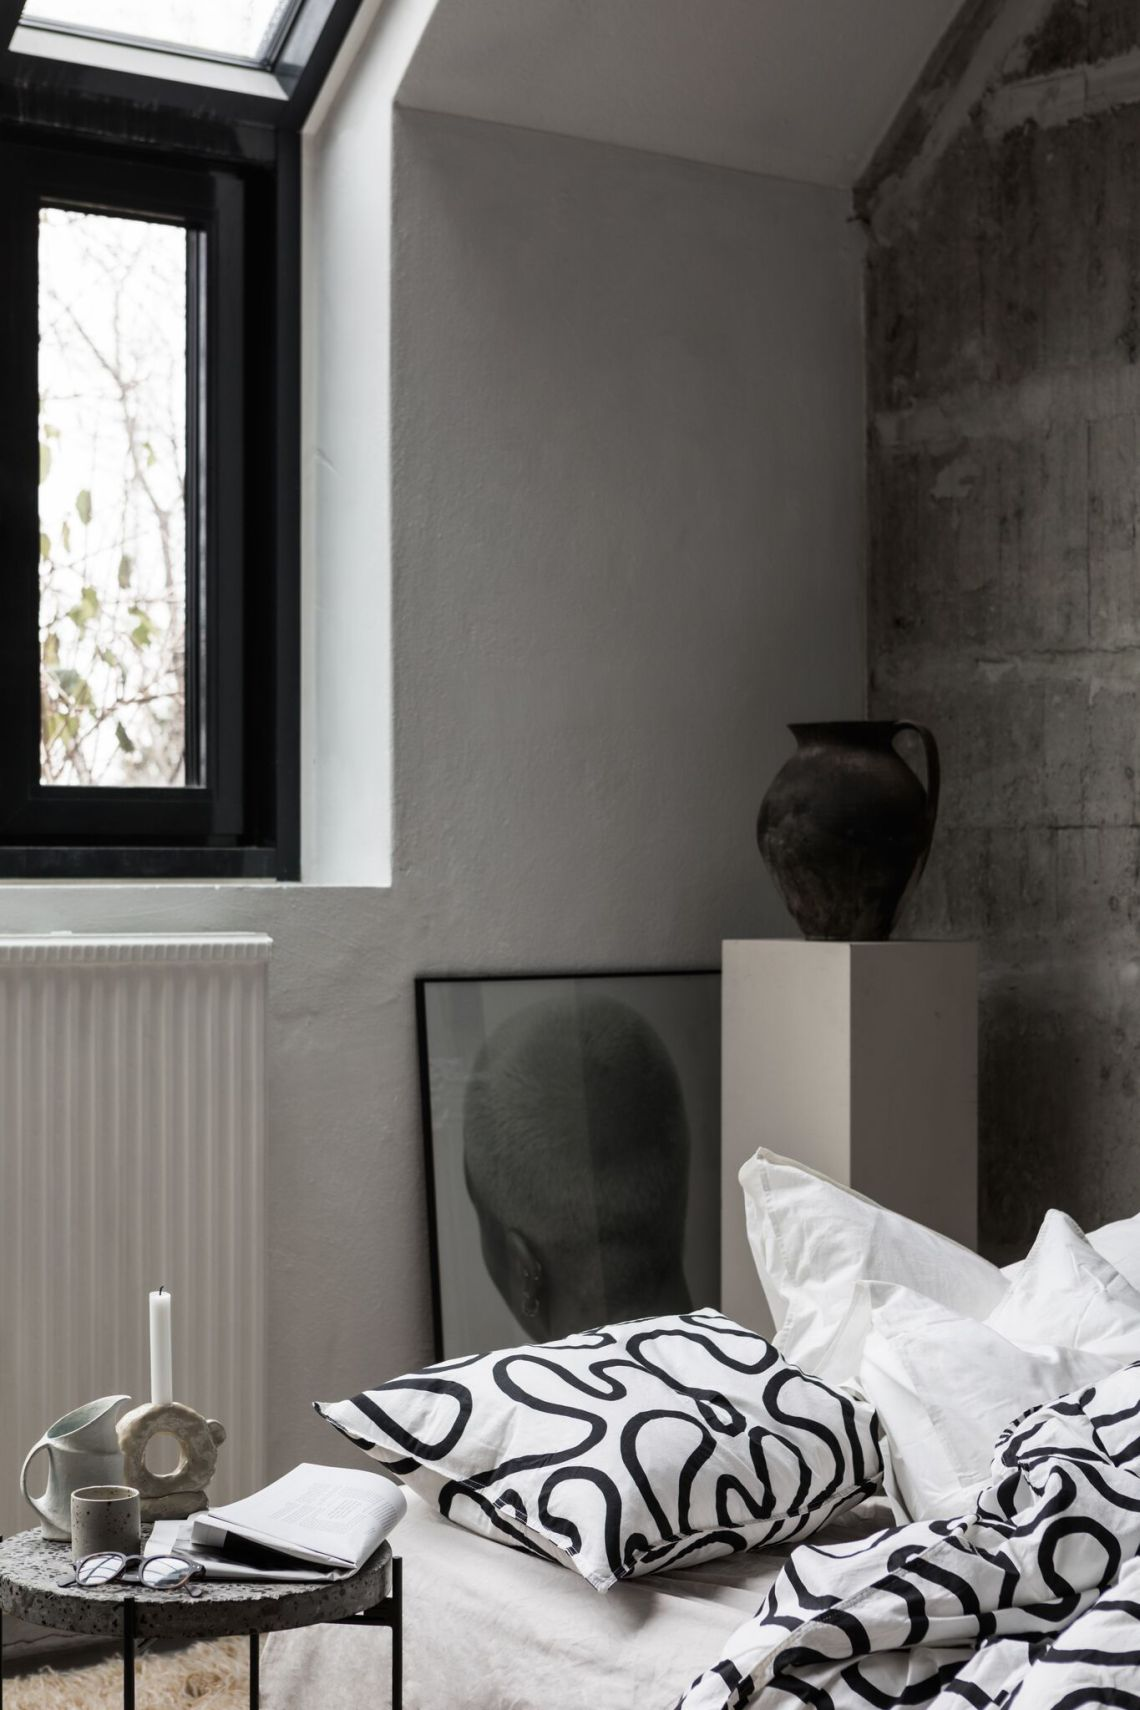 Elin Silfvast for Midnatt - via Coco Lapine Design blog